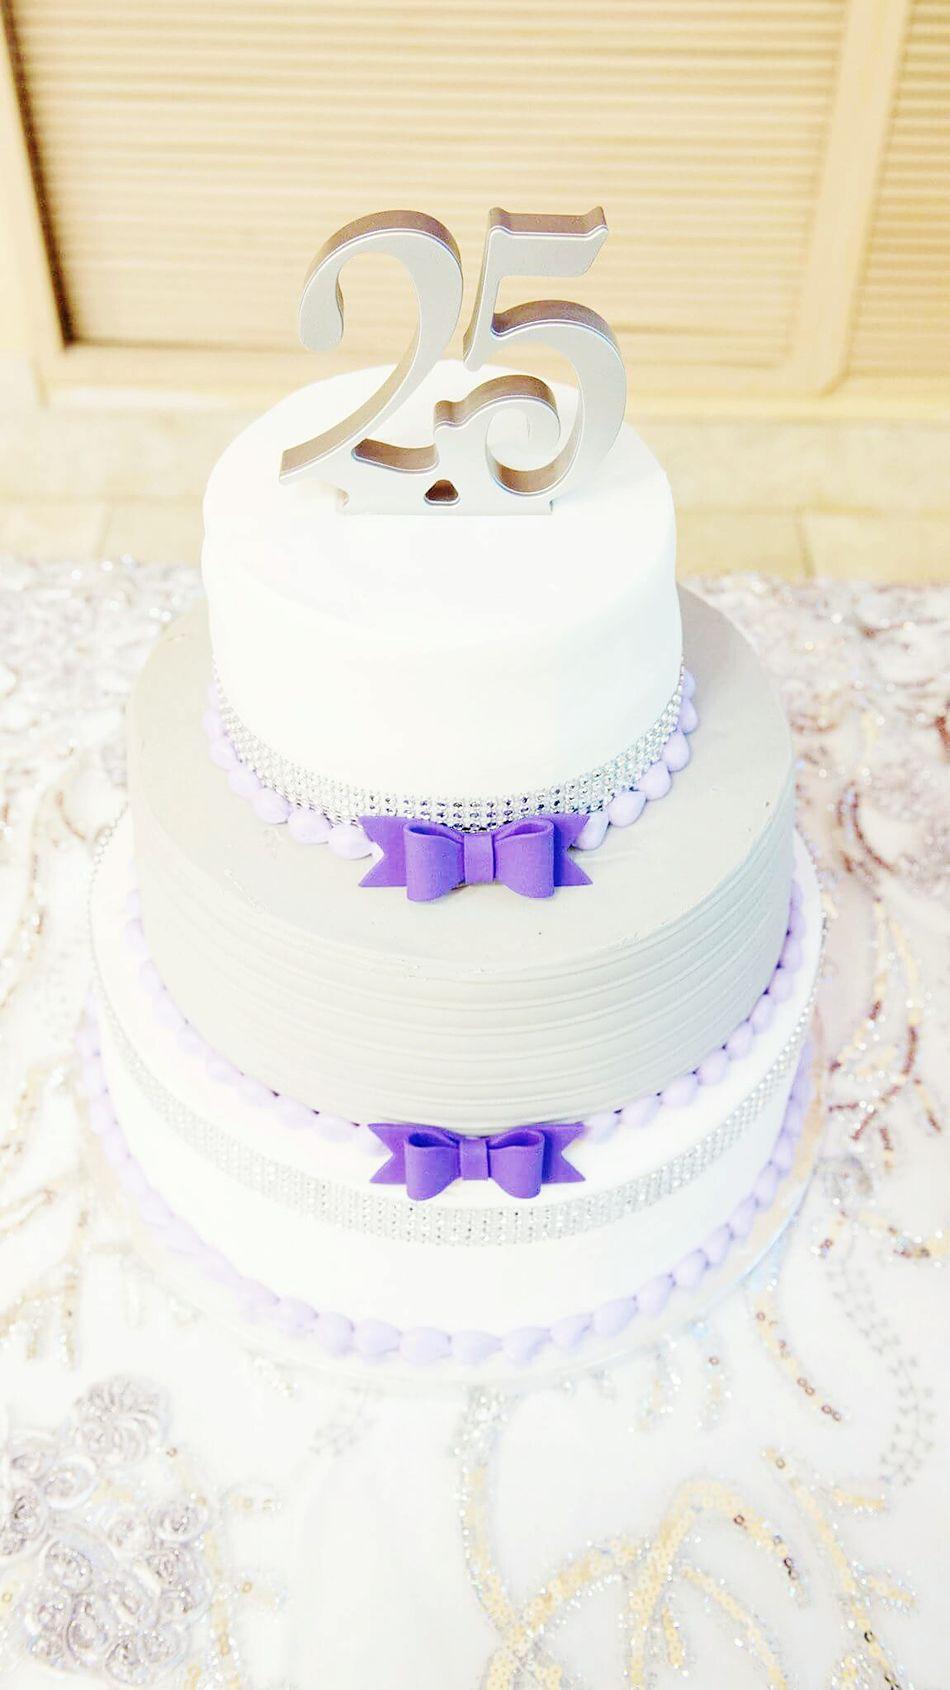 25th Wedding Anniversary Cake Wedding Celebration Party - Social Event Wedding Cake